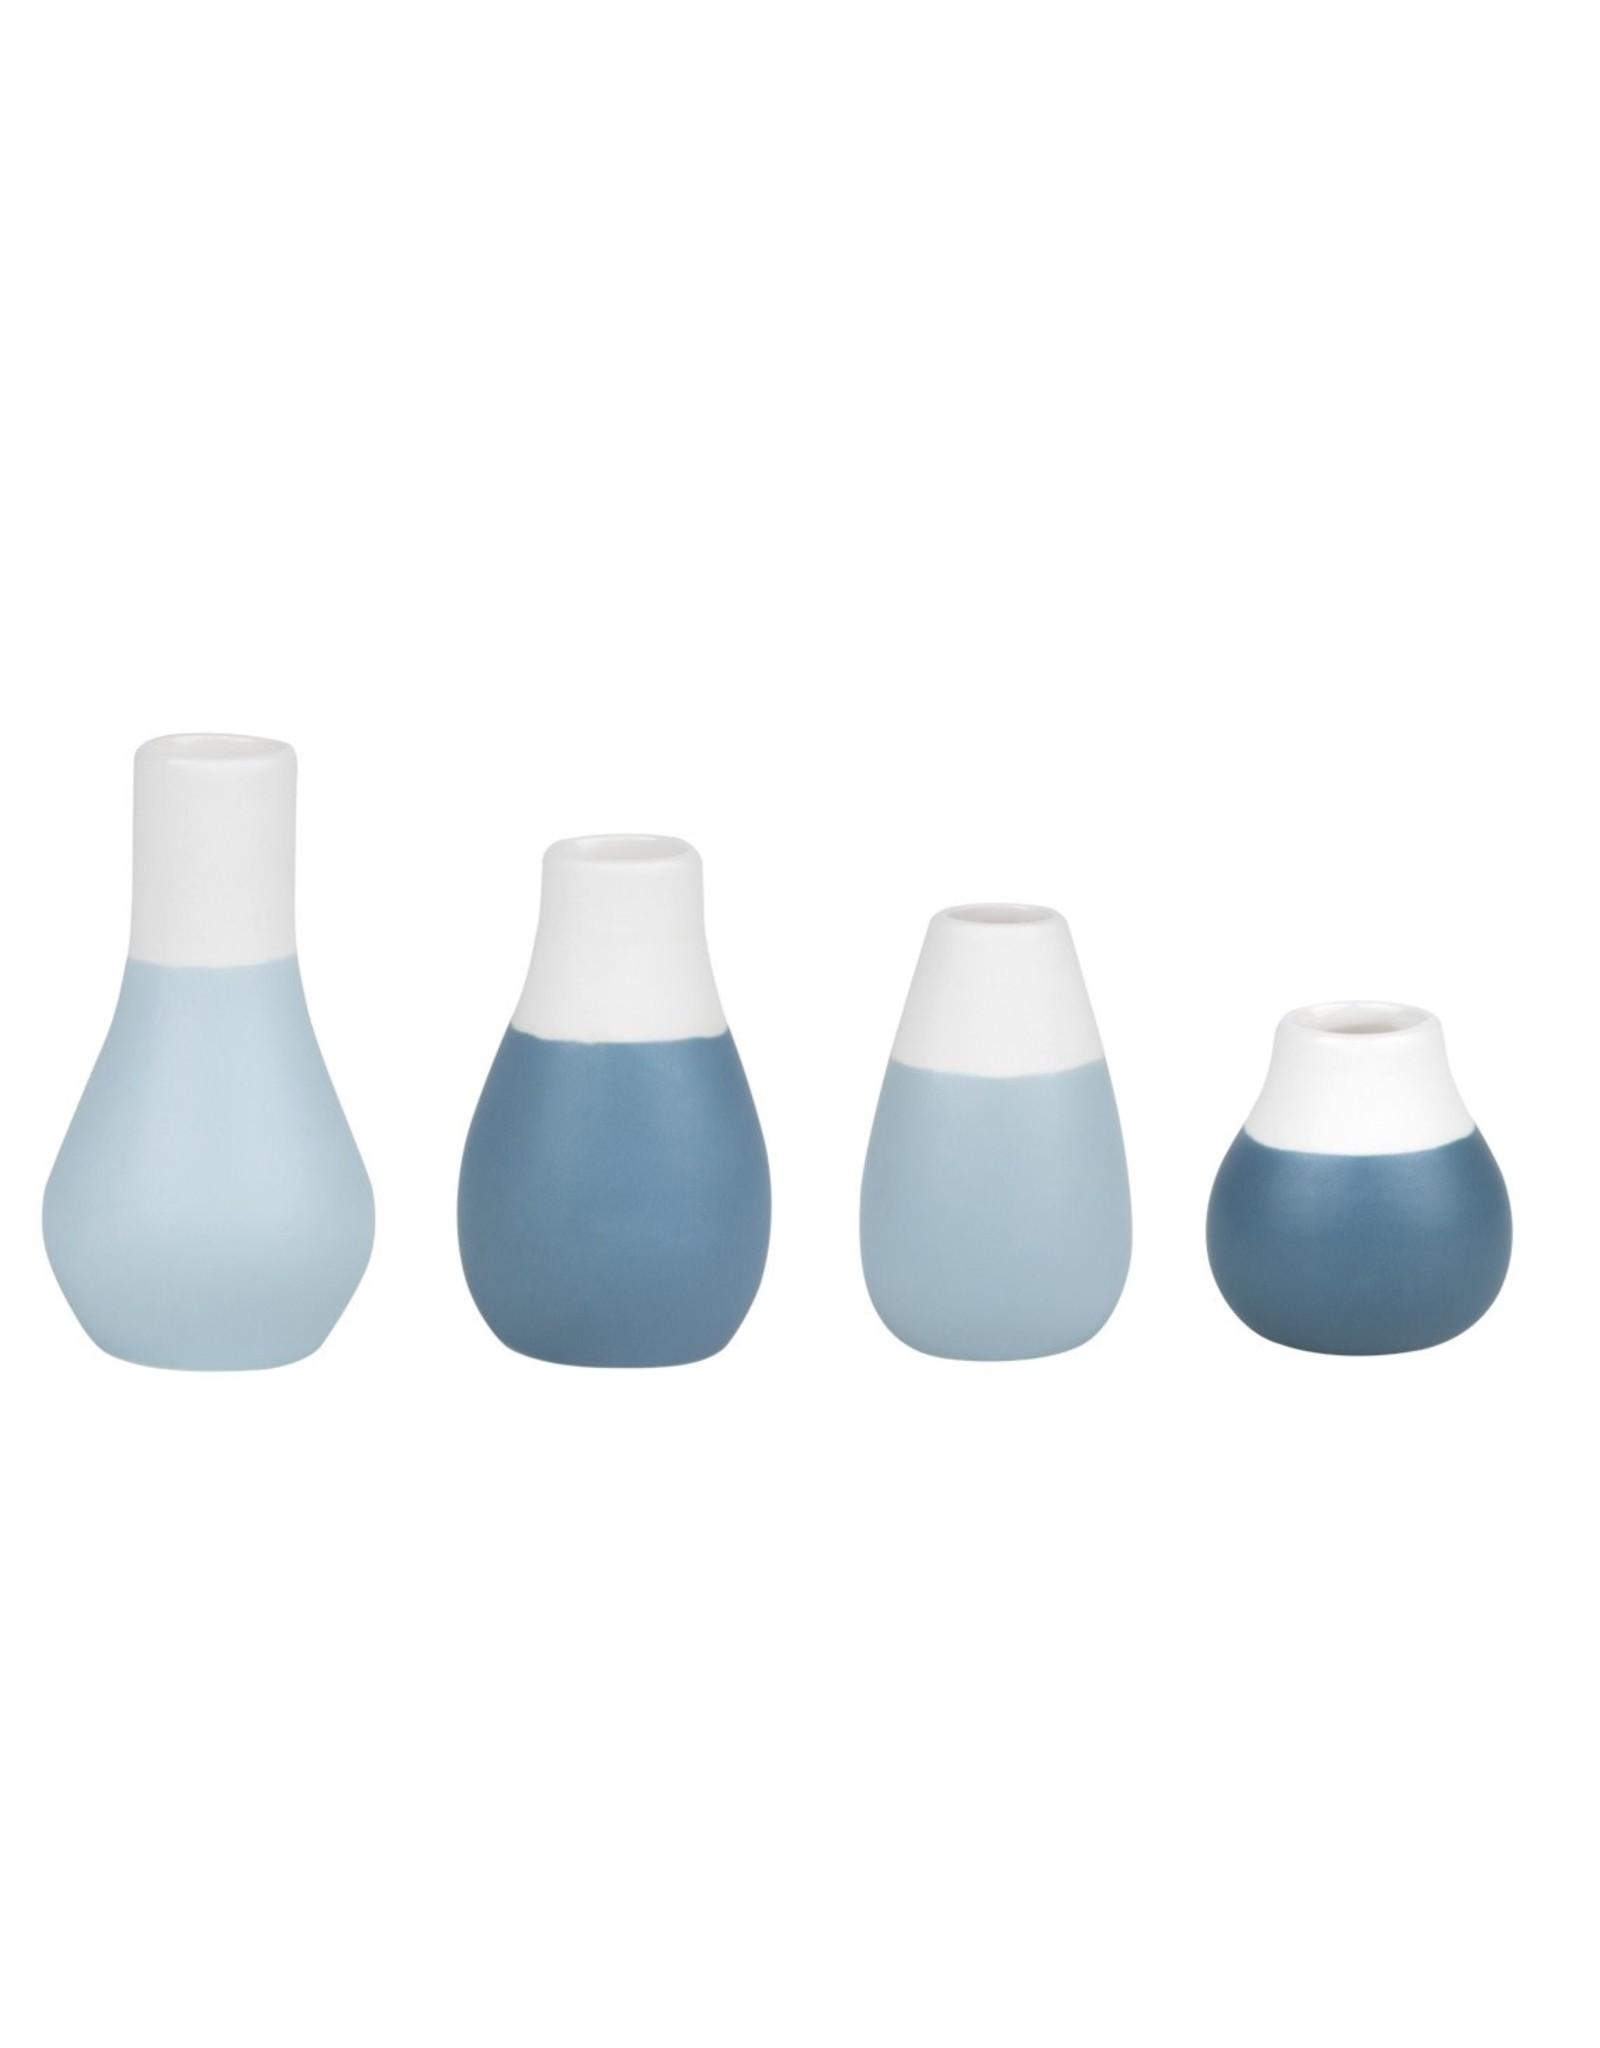 Raeder Plukselvaasjes Blauw - set v 4  - hoogte 4 - 8 cm